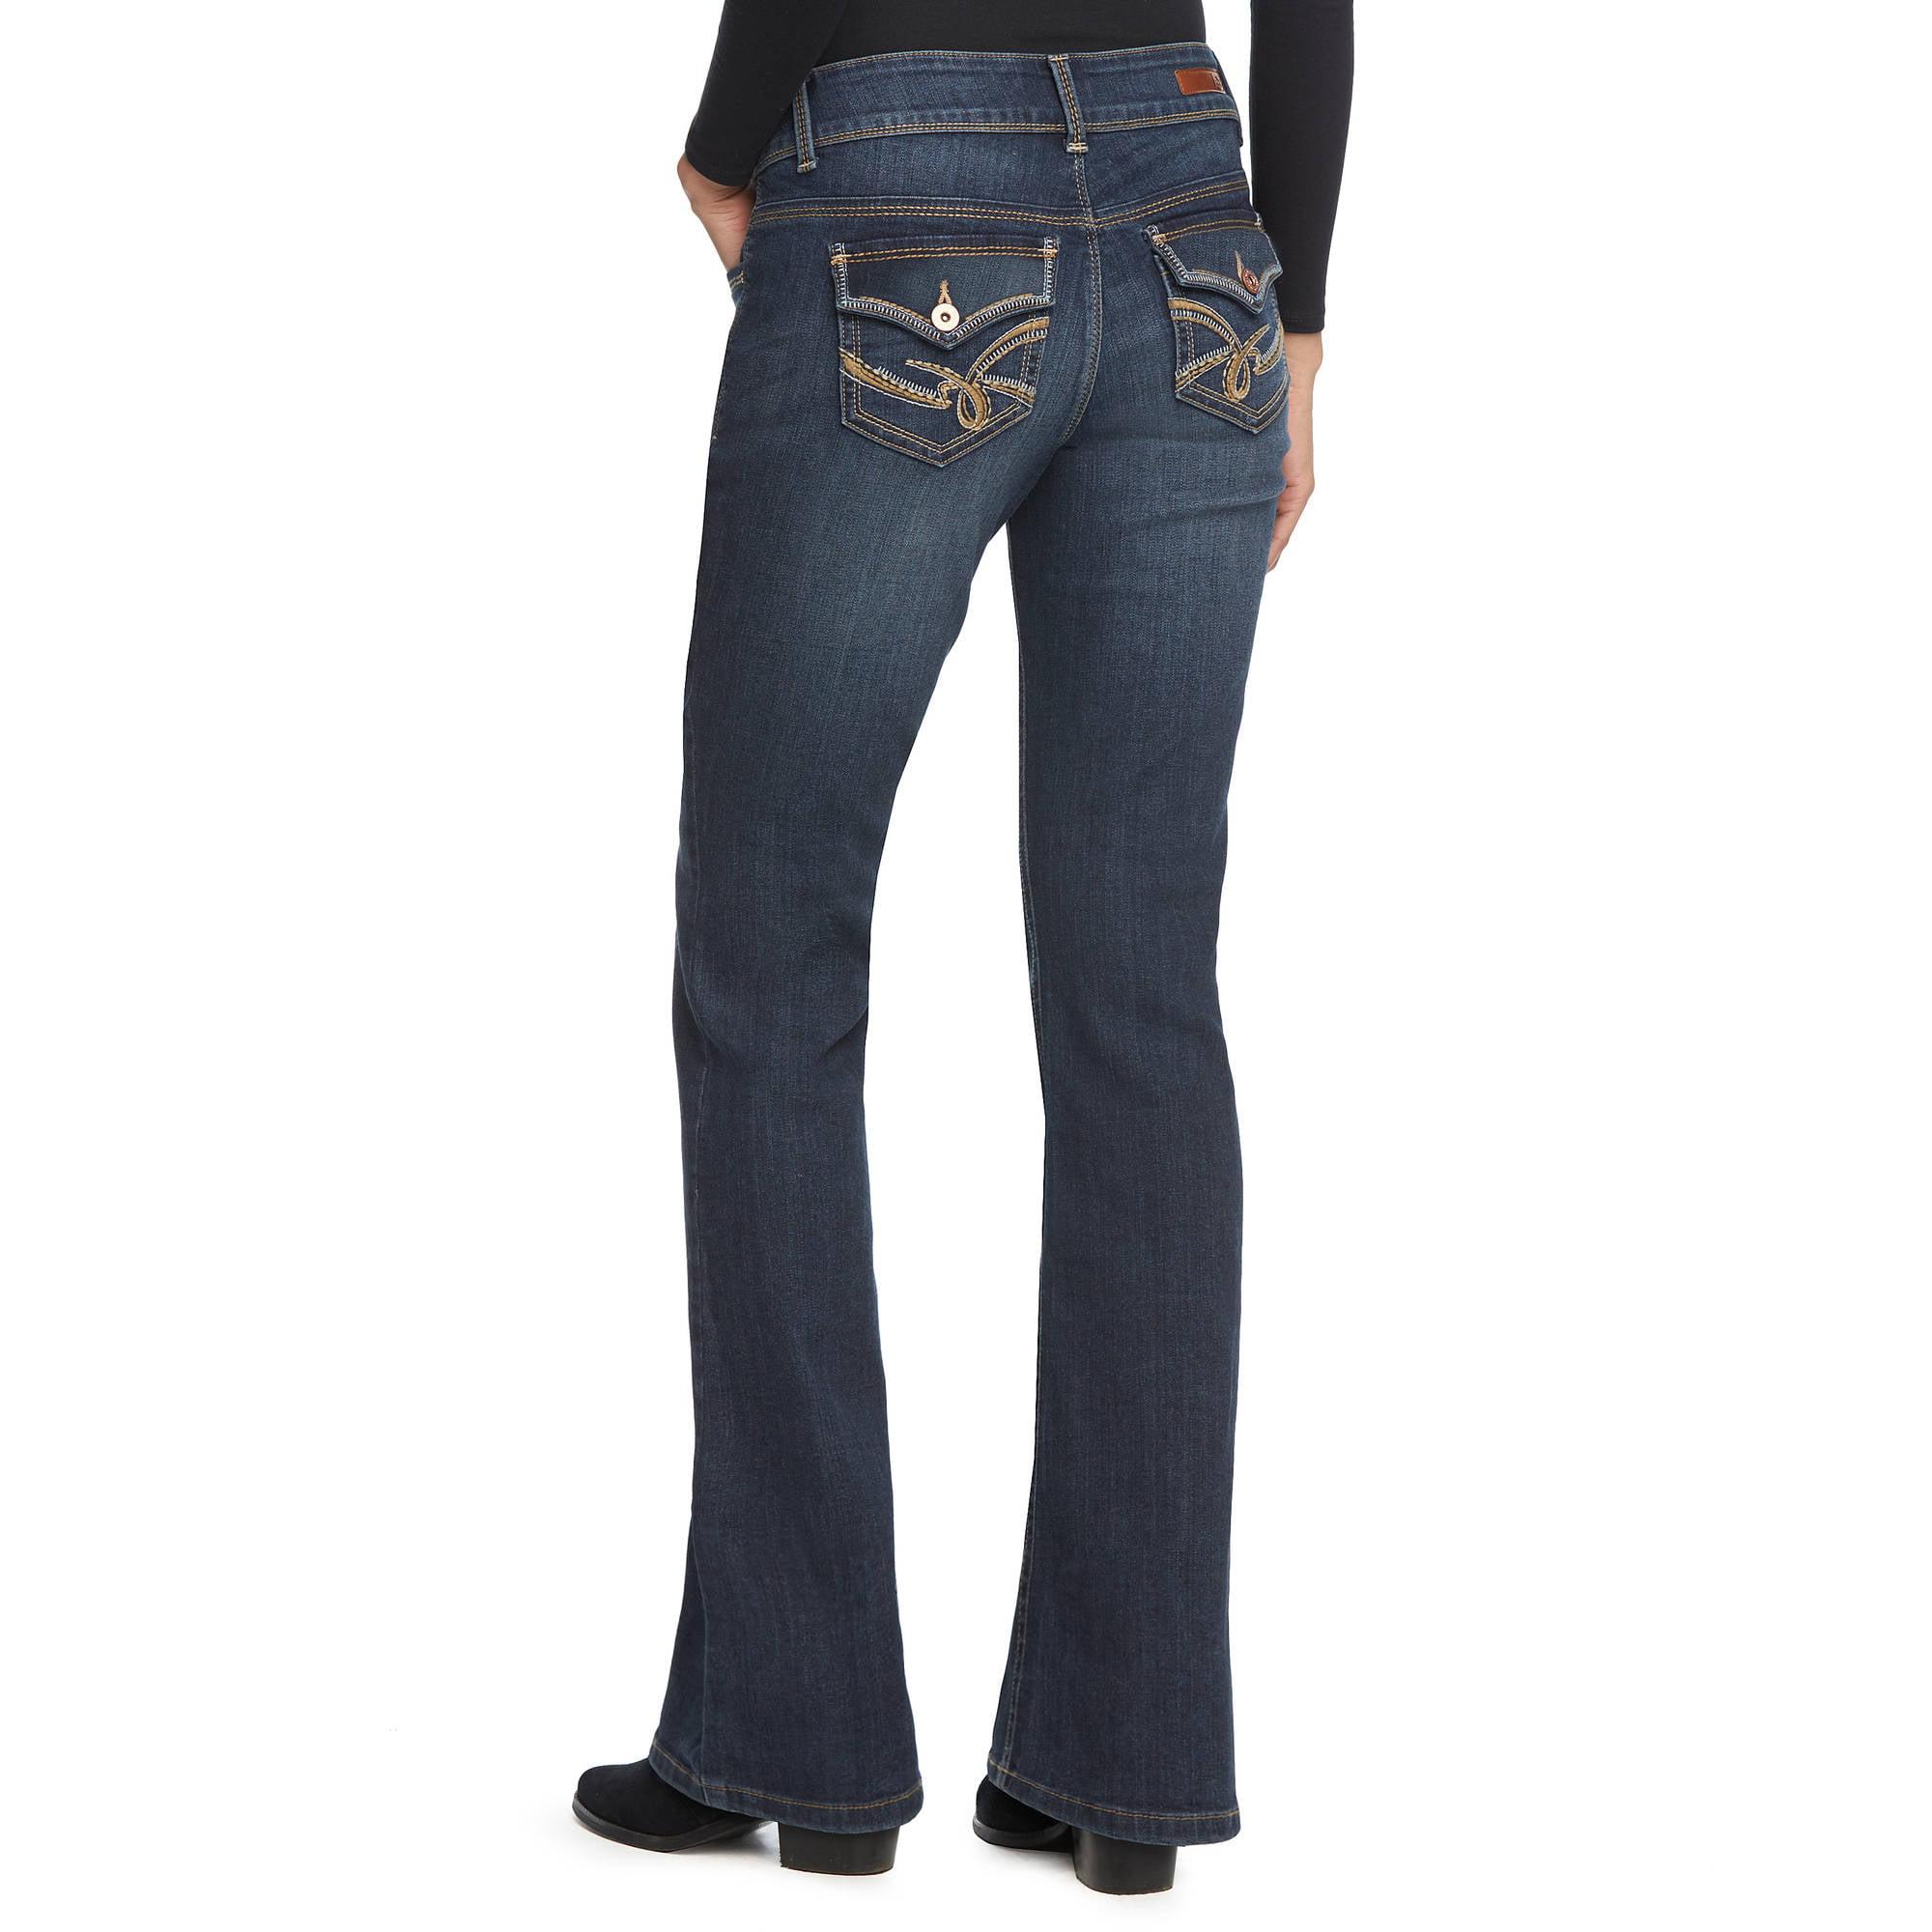 L.E.I. Juniors' Sophia Hipster Flare Jeans - Walmart.com